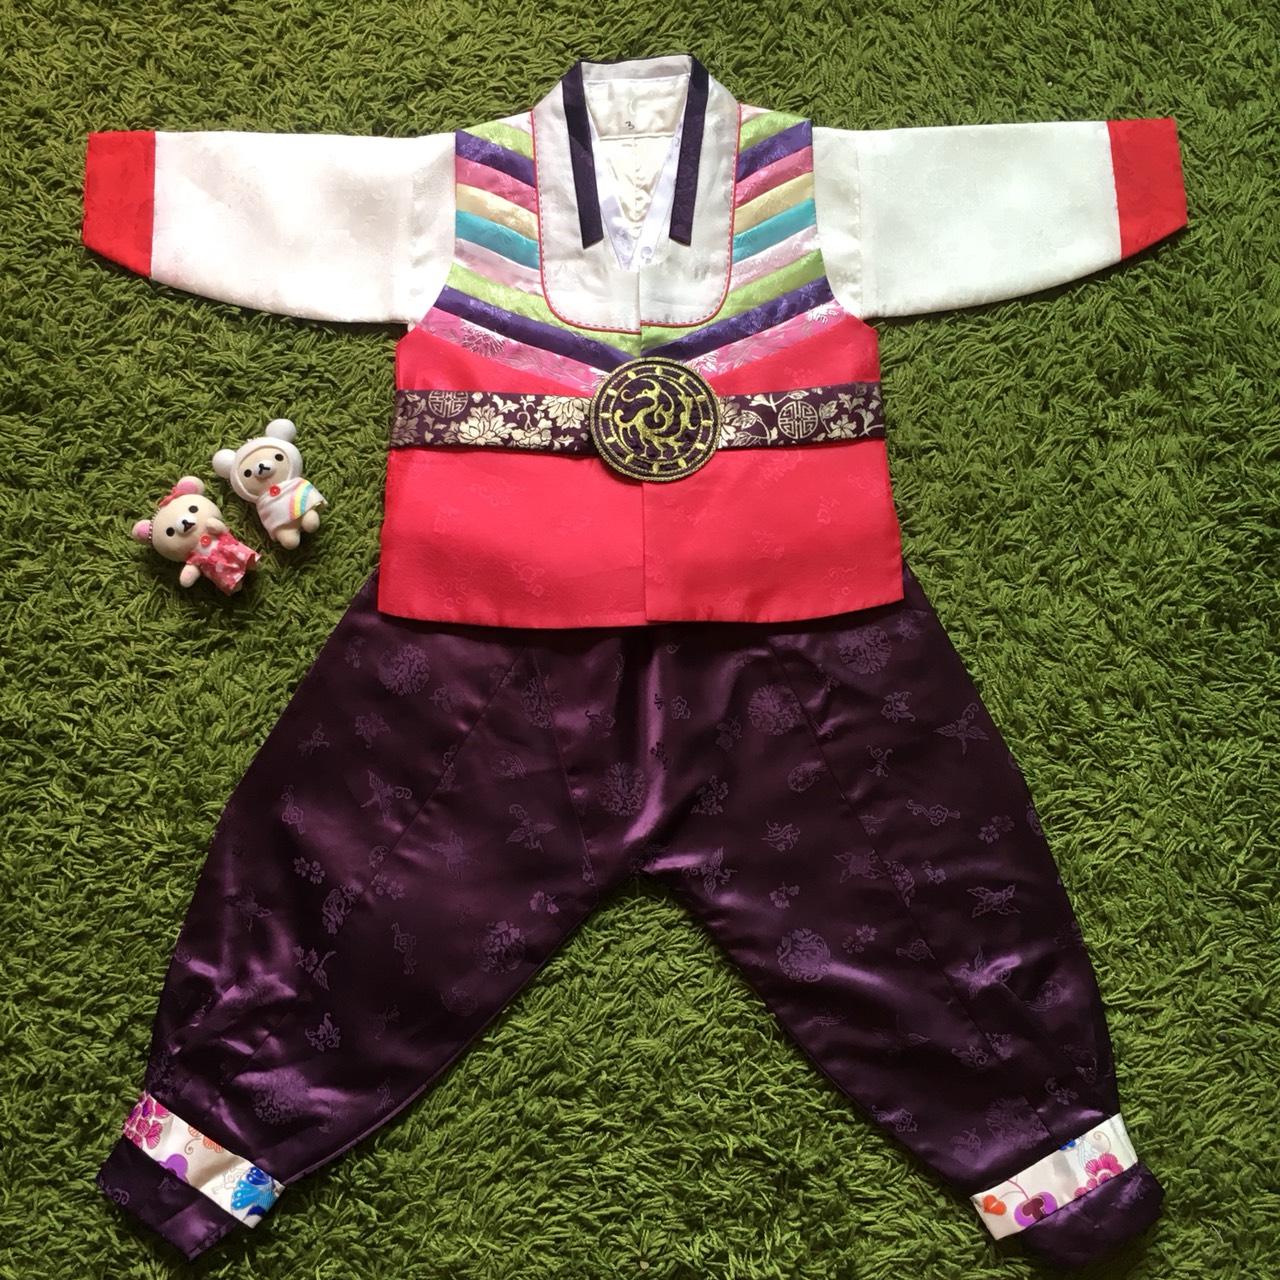 Hanbok Boy ฮันบกผ้าไหมชาววัง สำหรับเด็กชาย 3ขวบ